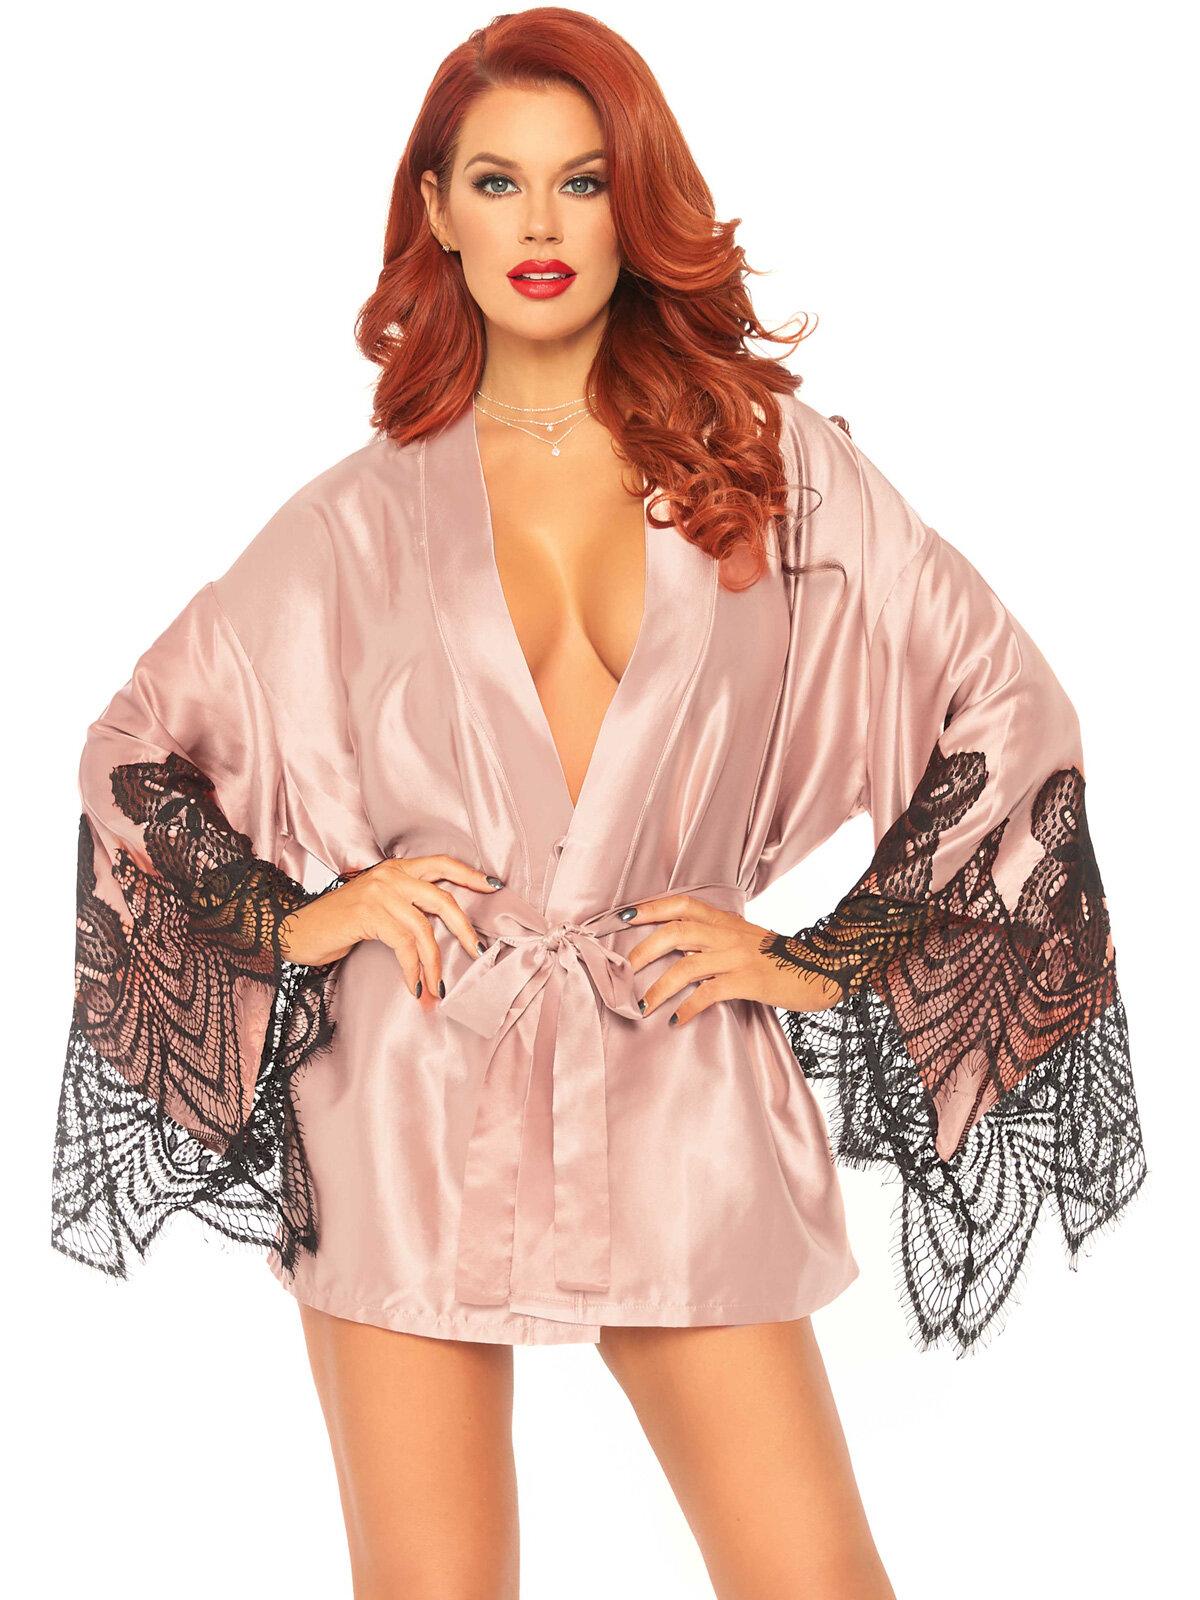 Halat 86105 Roz 86105 Satin robe with flared sleeves